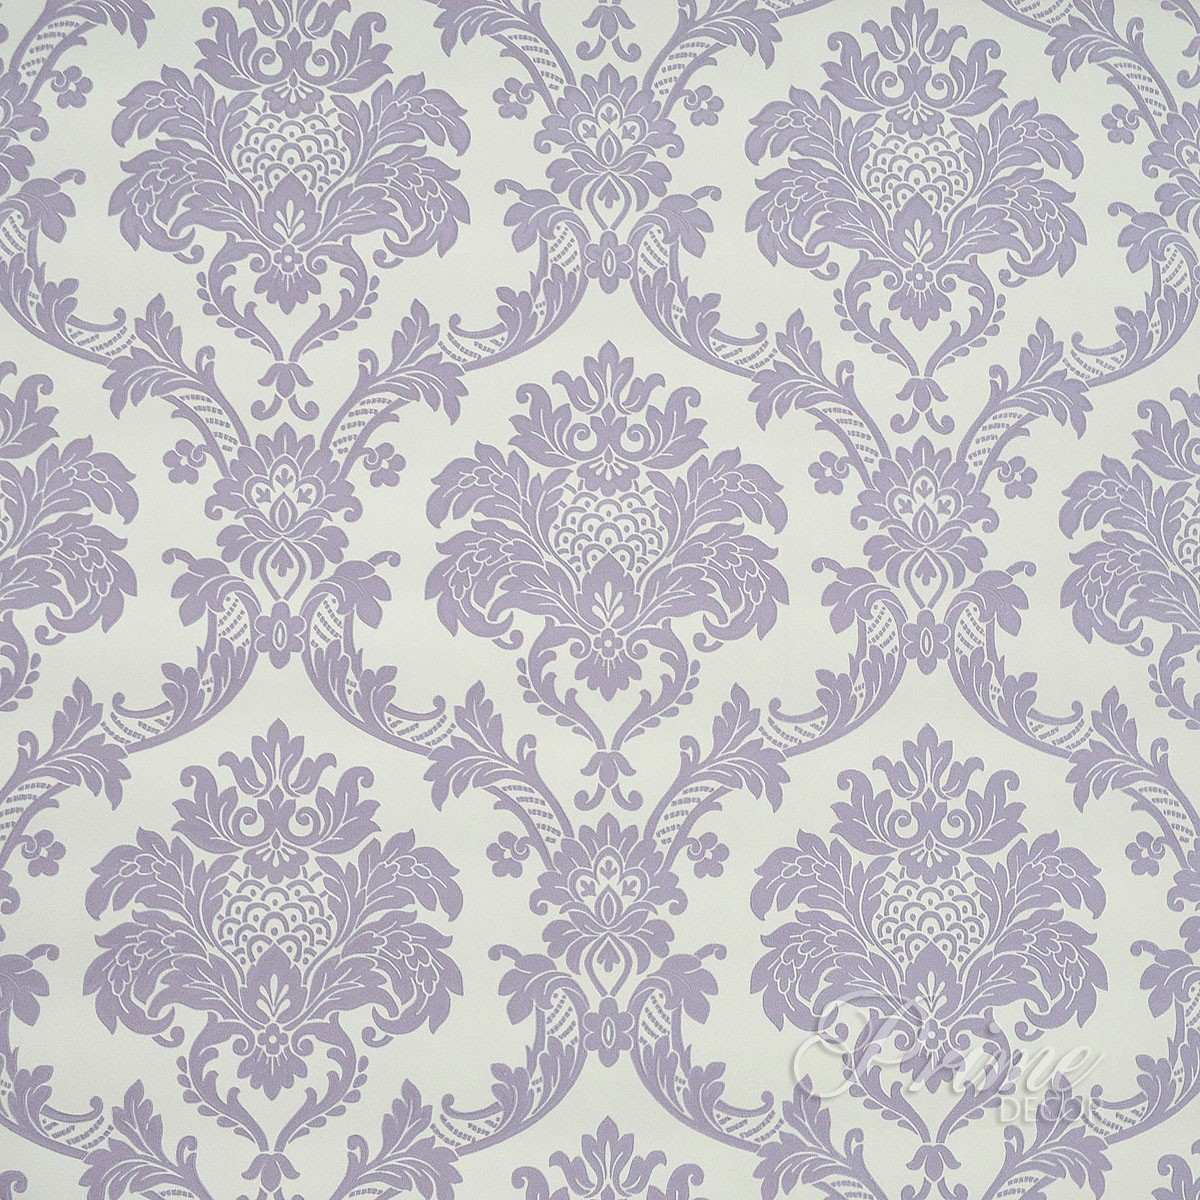 Papel de parede importado textura relevo damask roxo lil s for Papel de pared plata